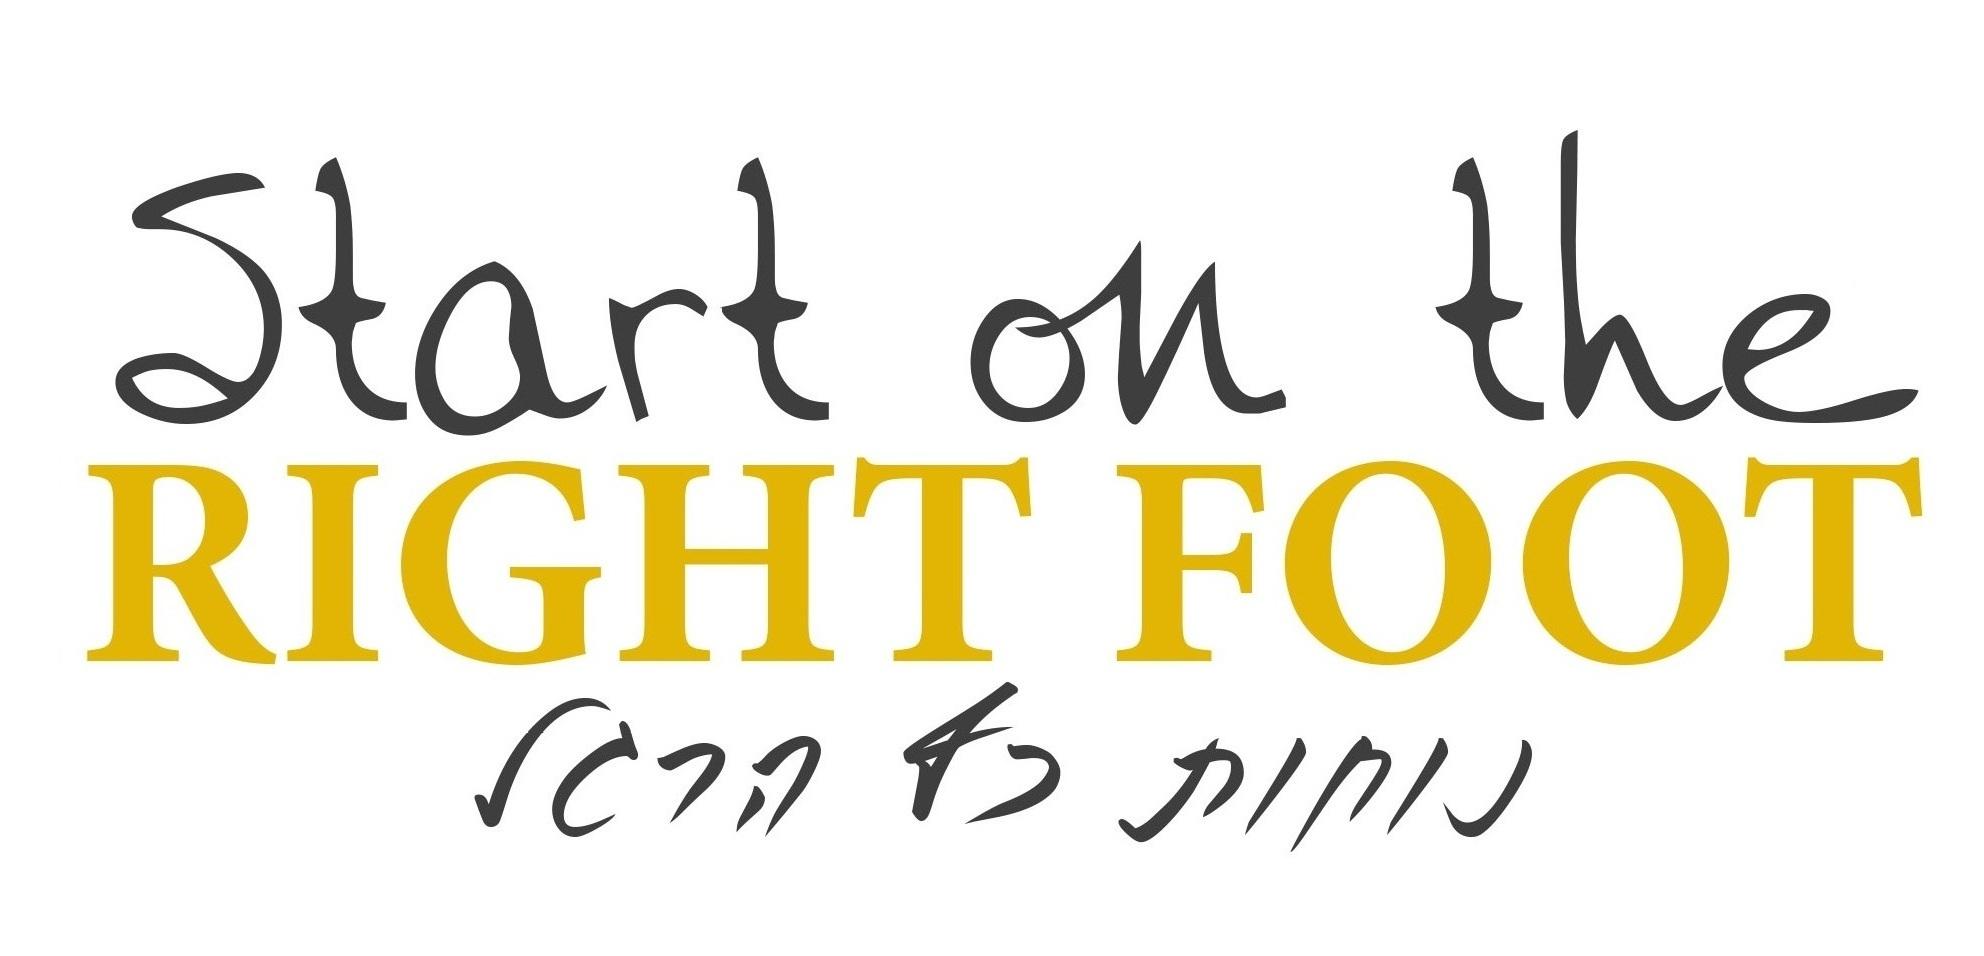 Rightfootlogo